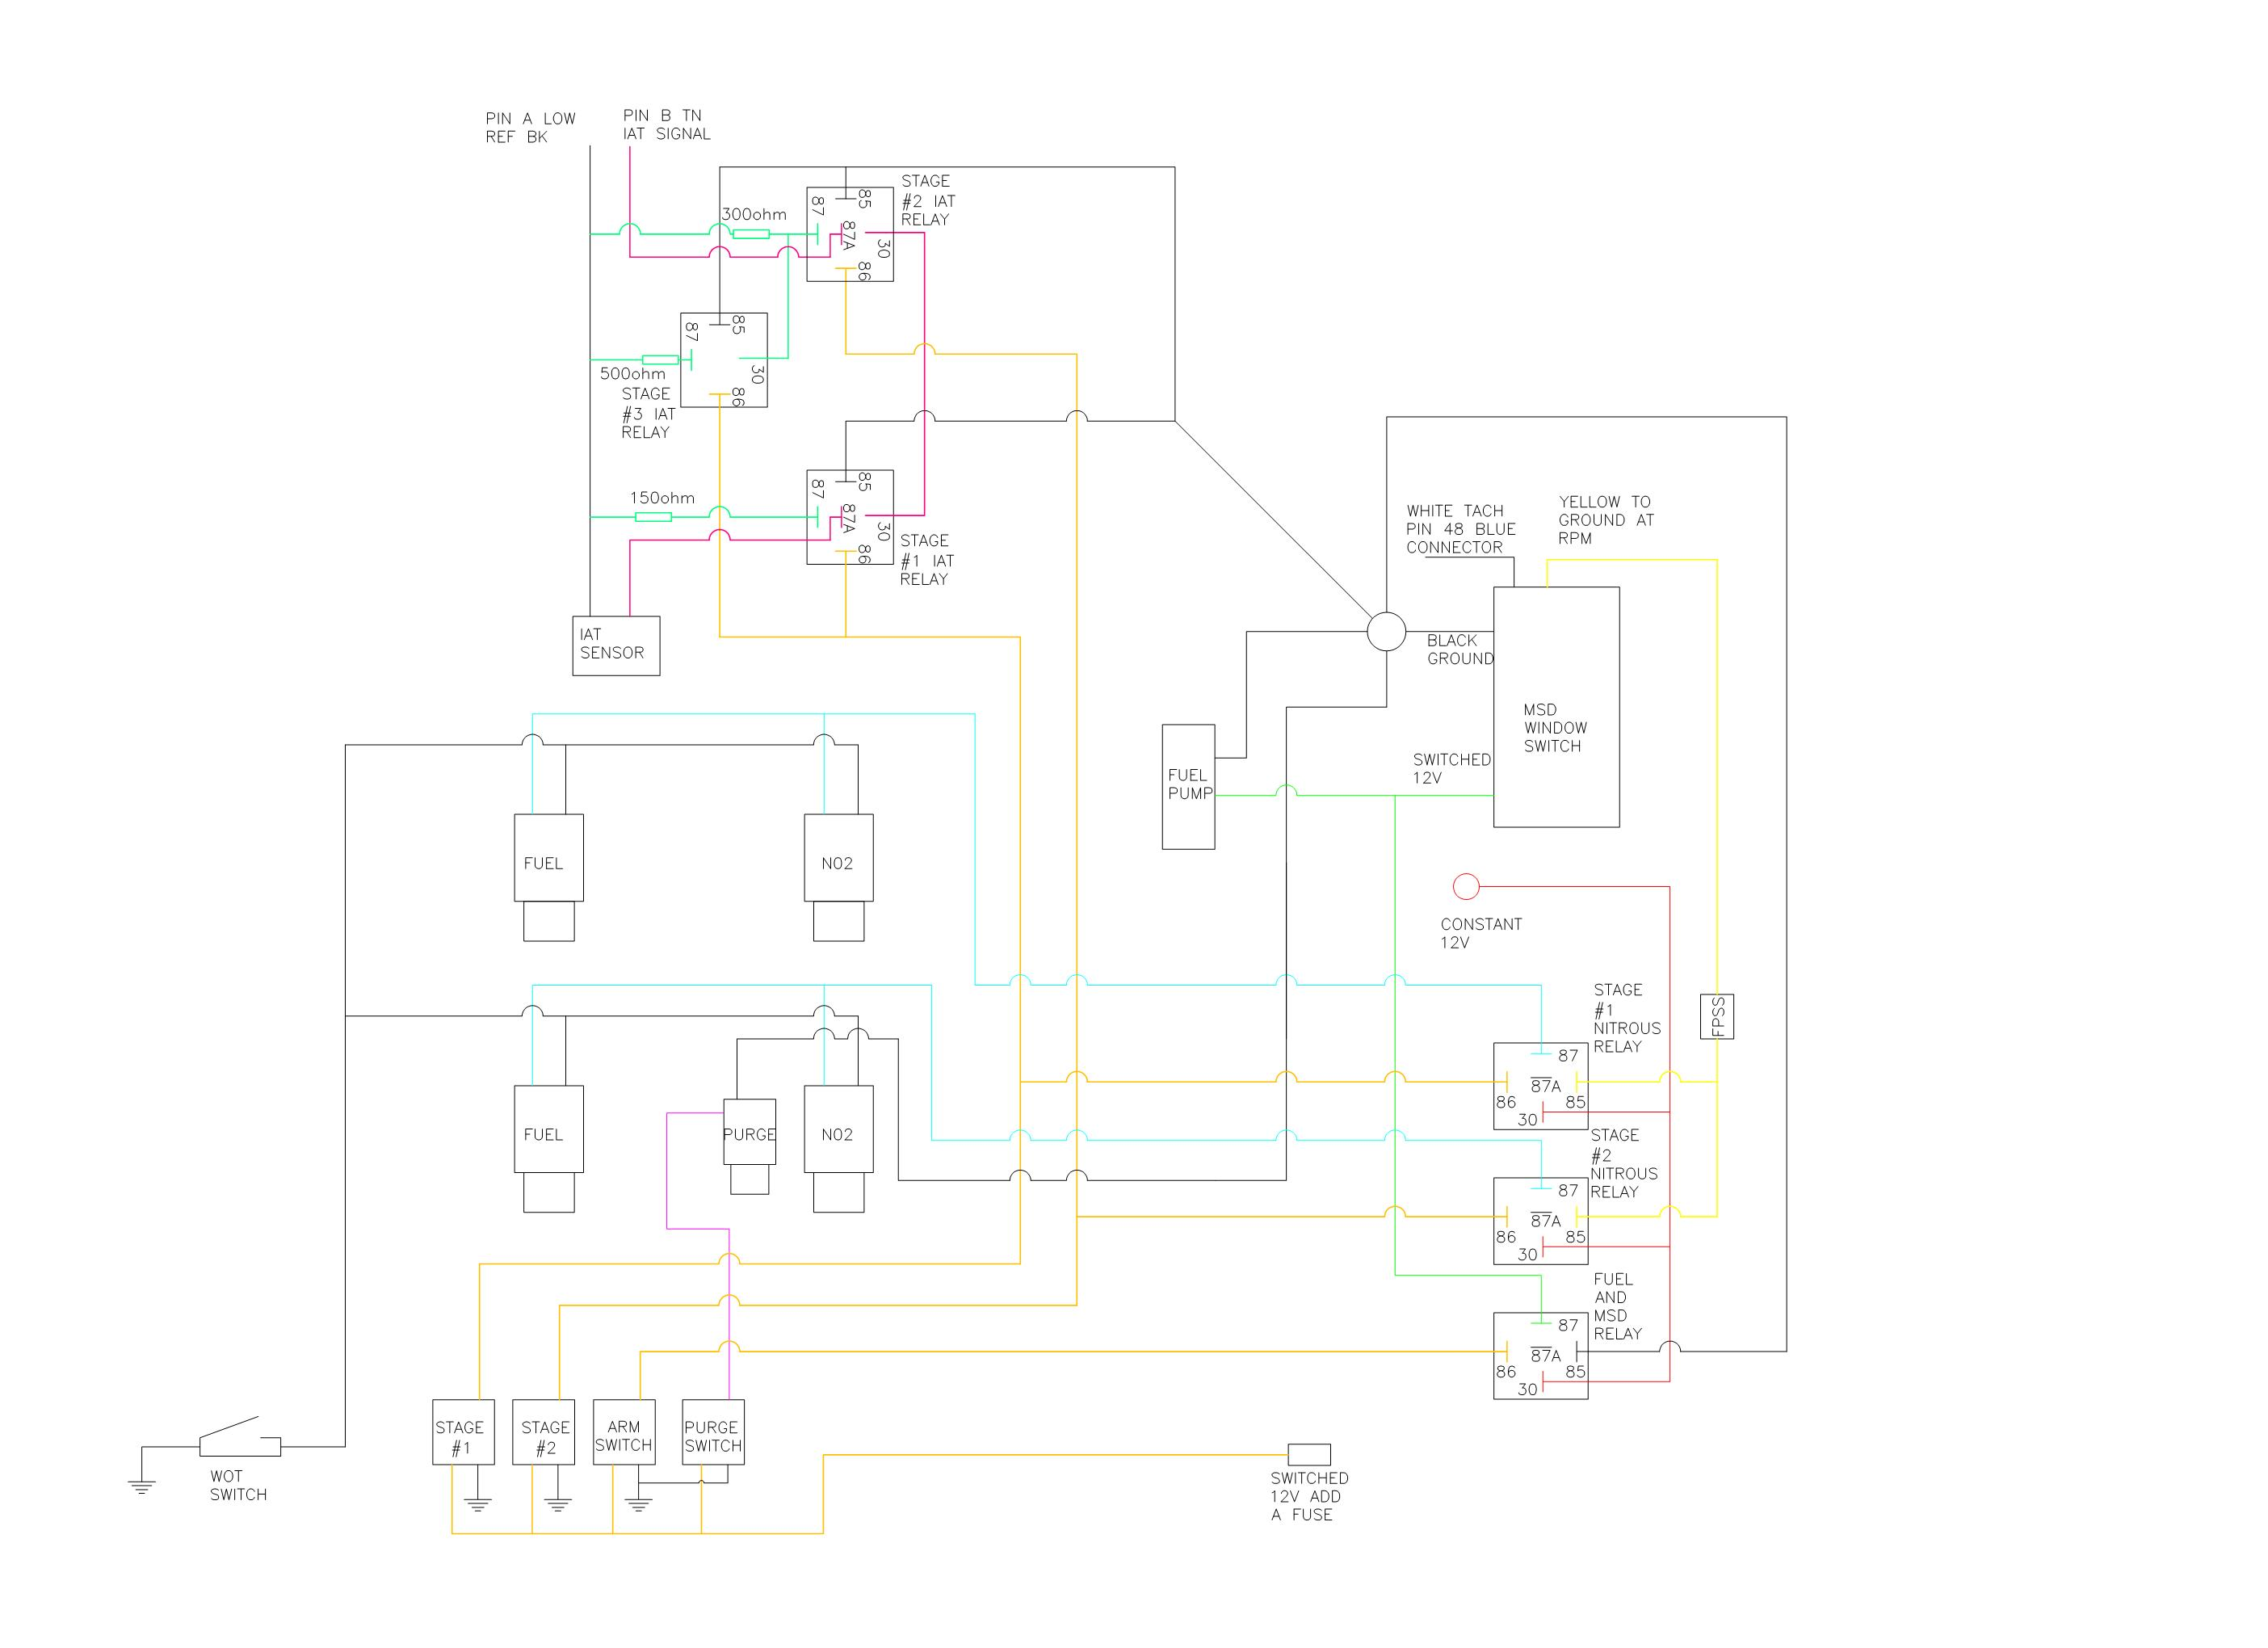 honeywell ra89a wiring schematic honeywell ra89a switching relay honeywell smart valve wiring diagram honeywell t8011r wiring diagram 31 wiring diagram images wiring honeywell ra89a relay honeywell ra89a wiring schematic